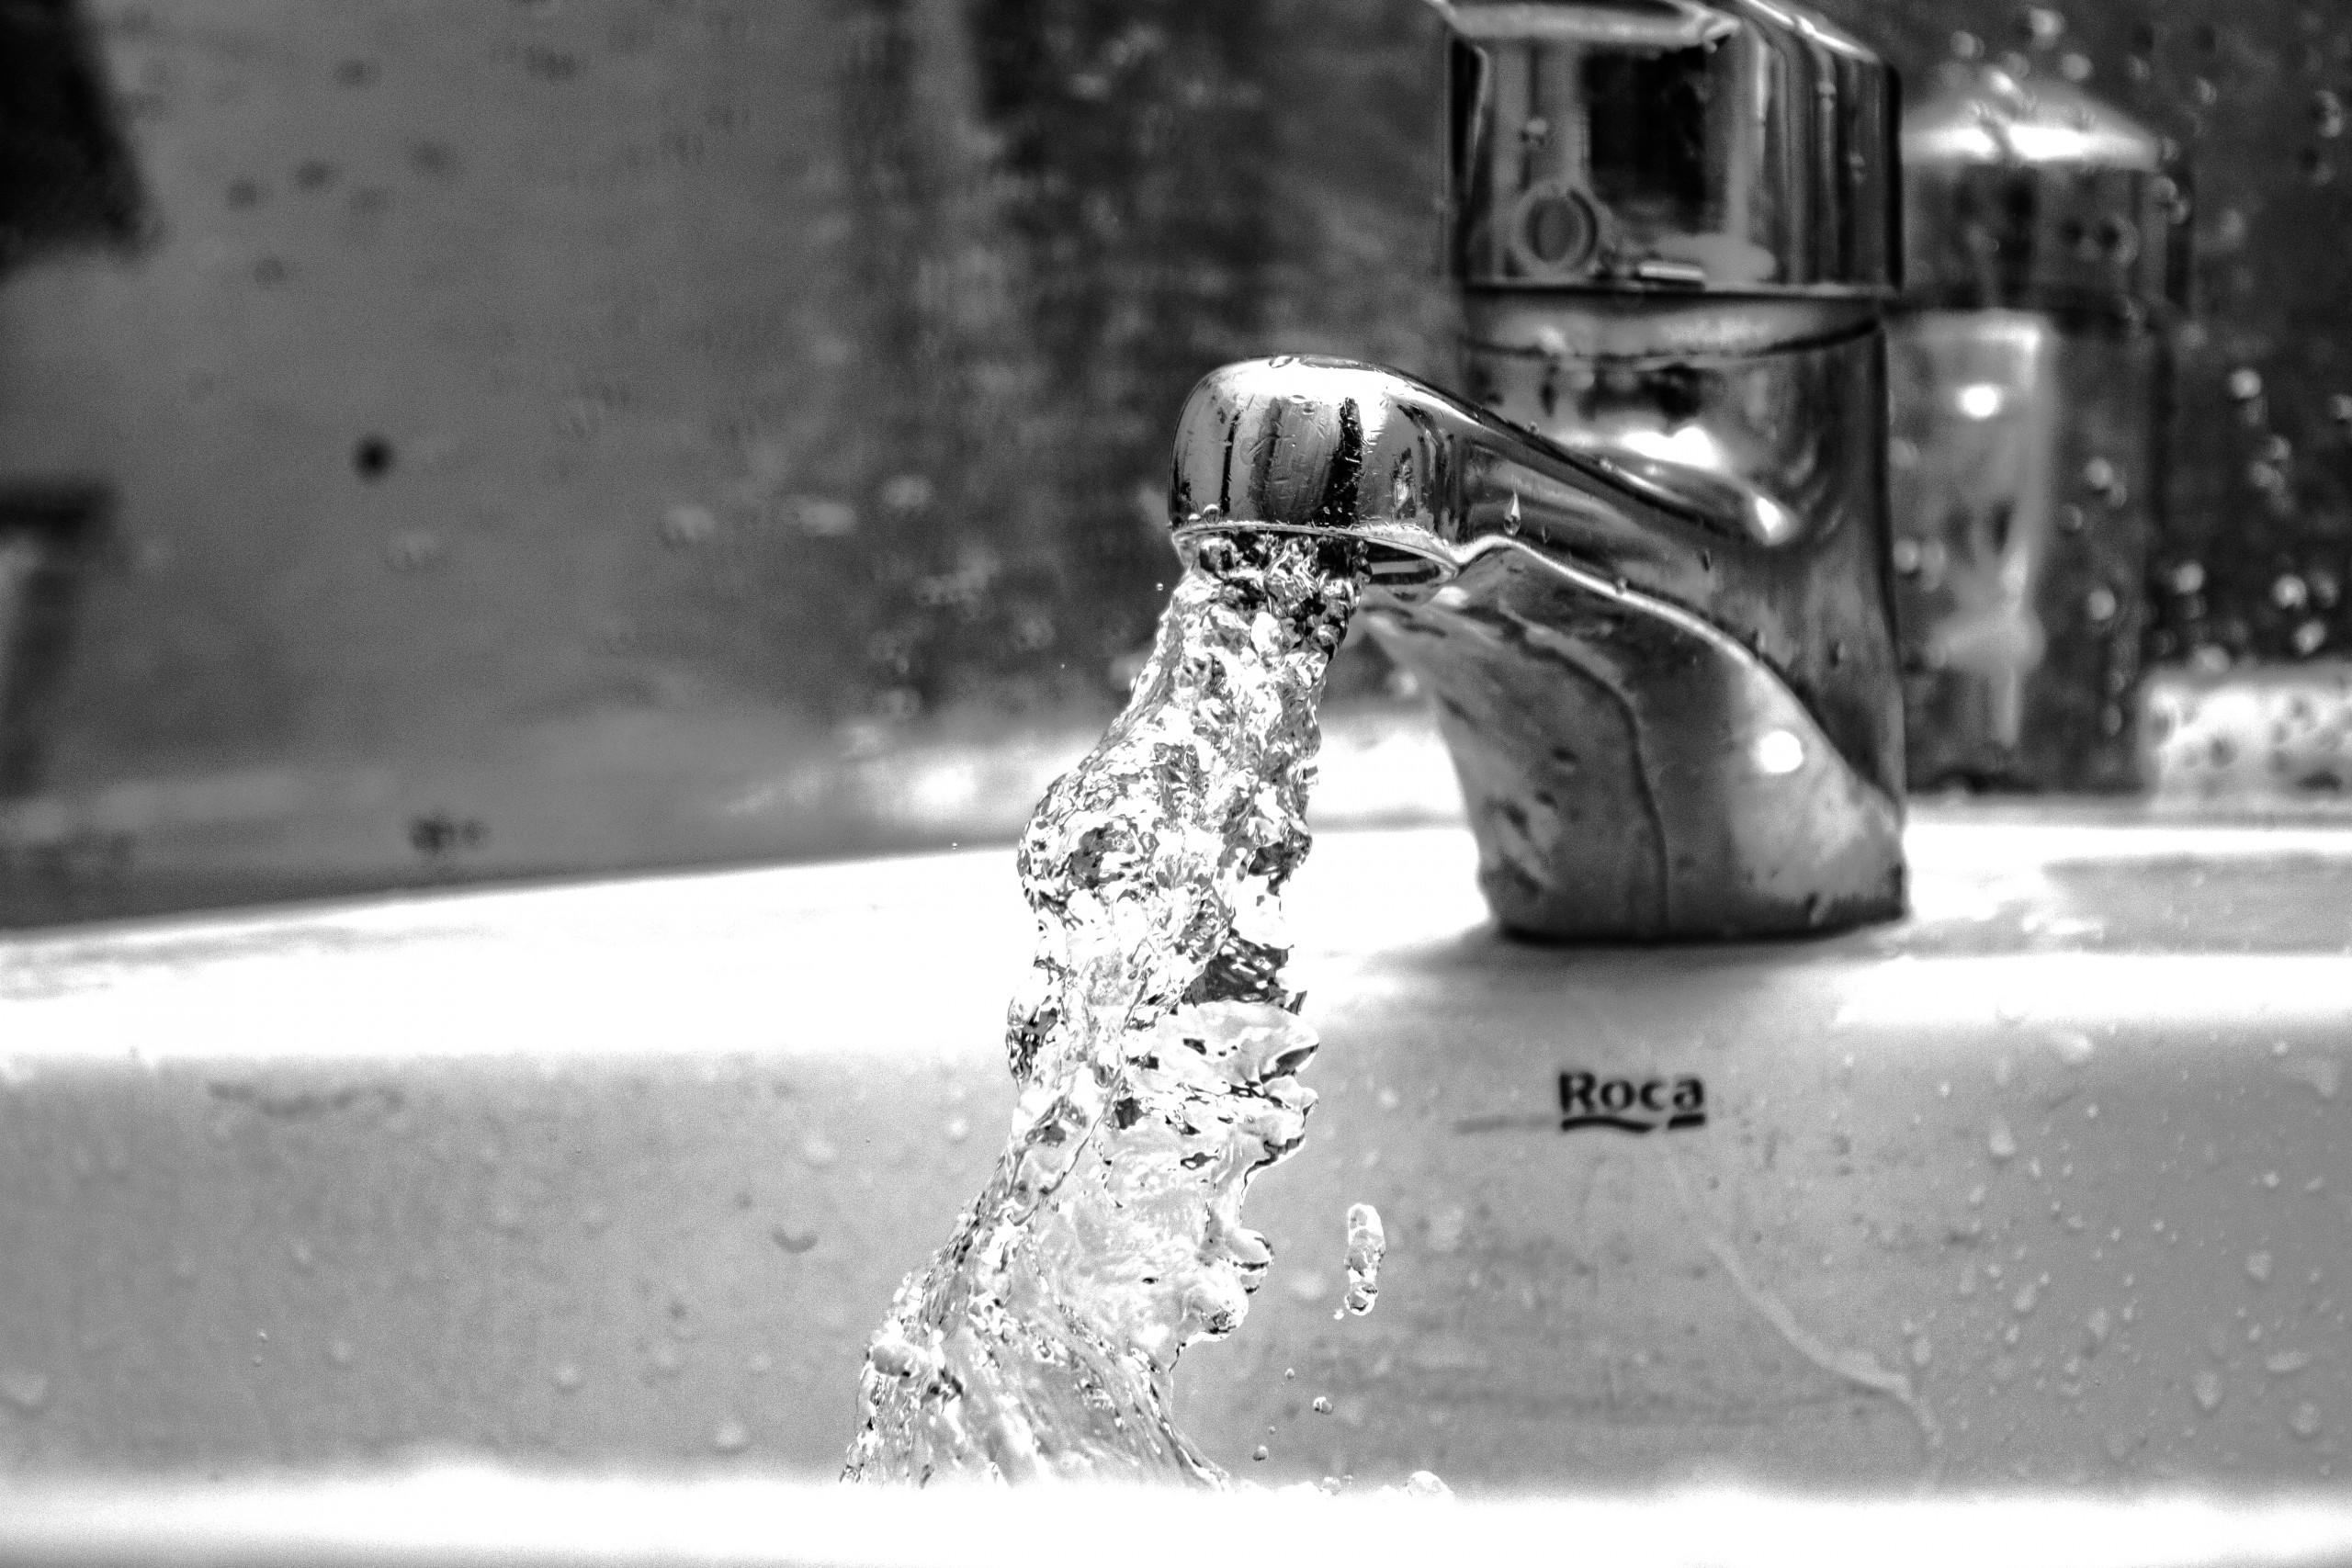 Tosab Photography Hc8wujr5s Q Unsplash